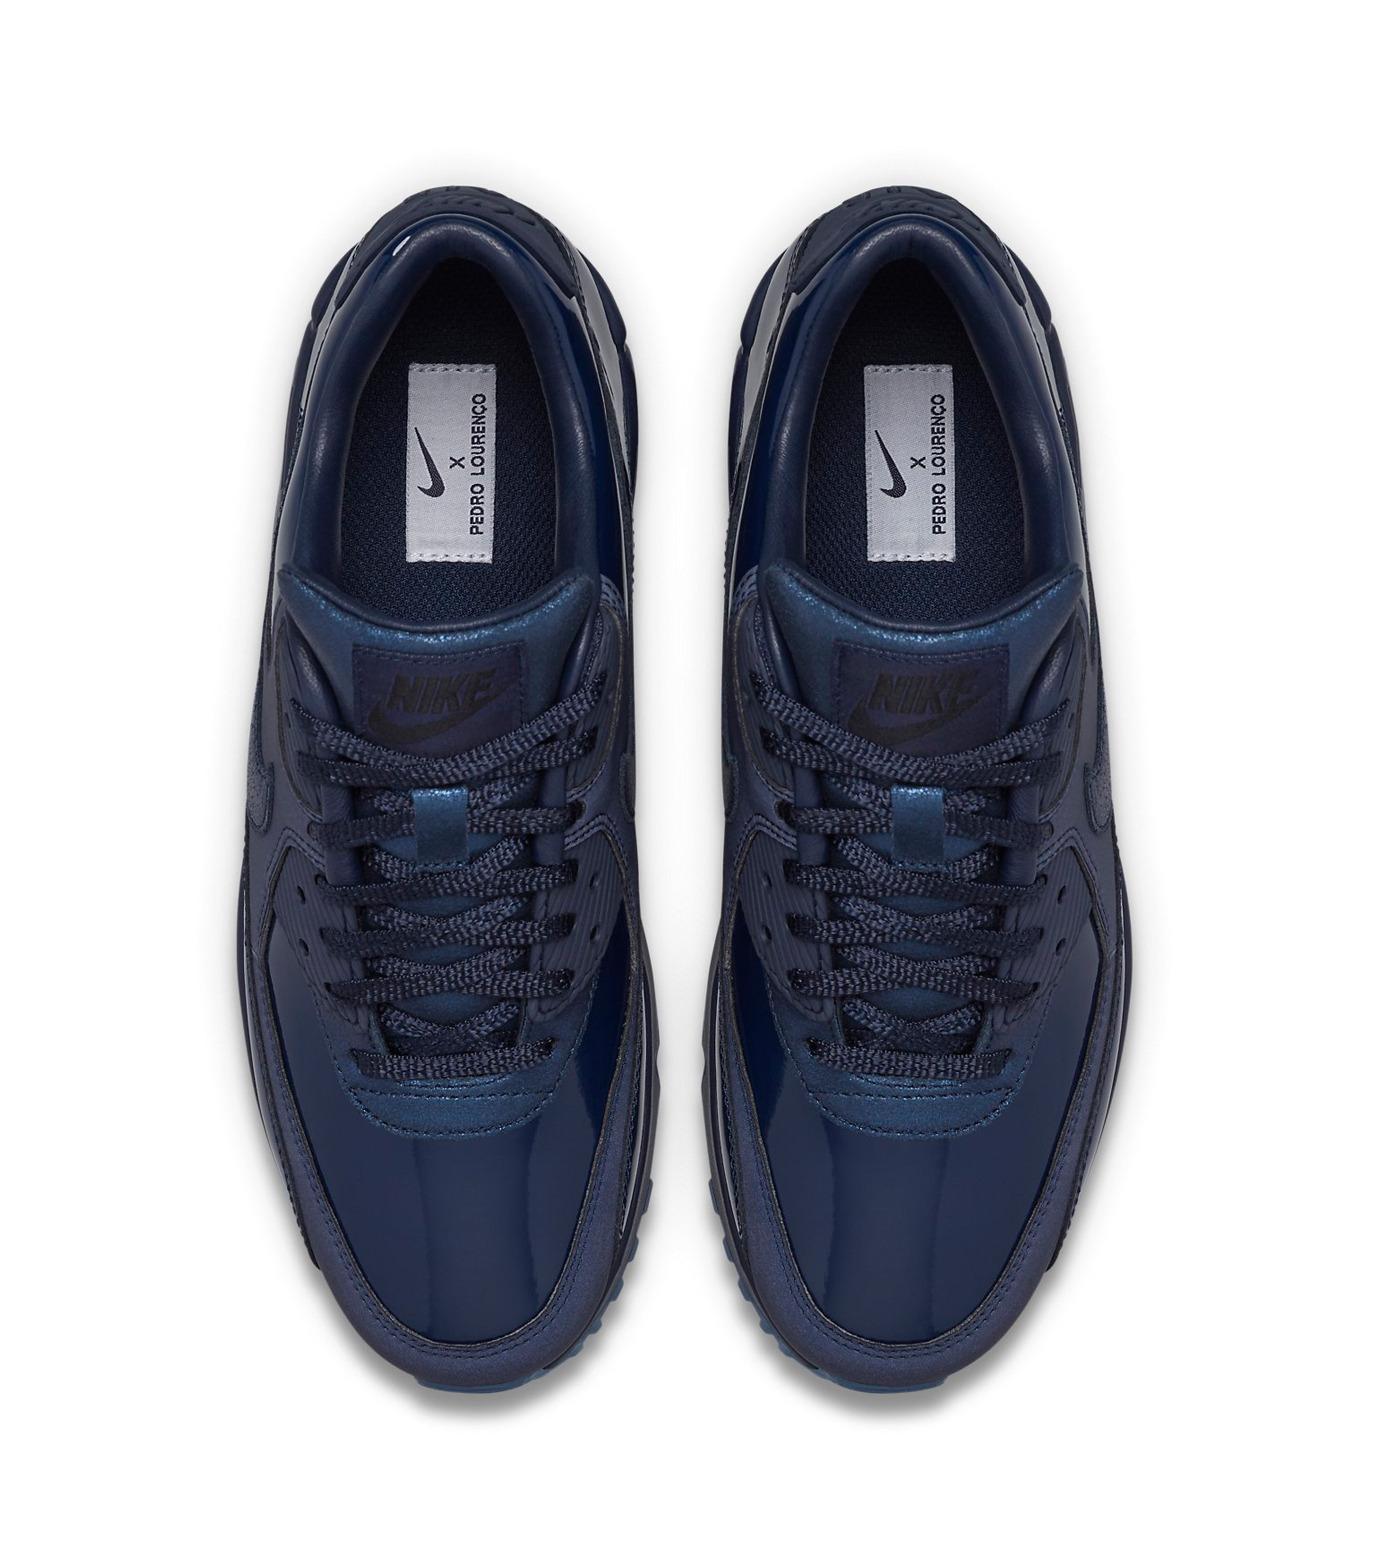 NIKE(ナイキ)のWMNS AIR MAX PEDRO LOURENCO-BLUE(シューズ/shoes)-867116-400-92 拡大詳細画像4